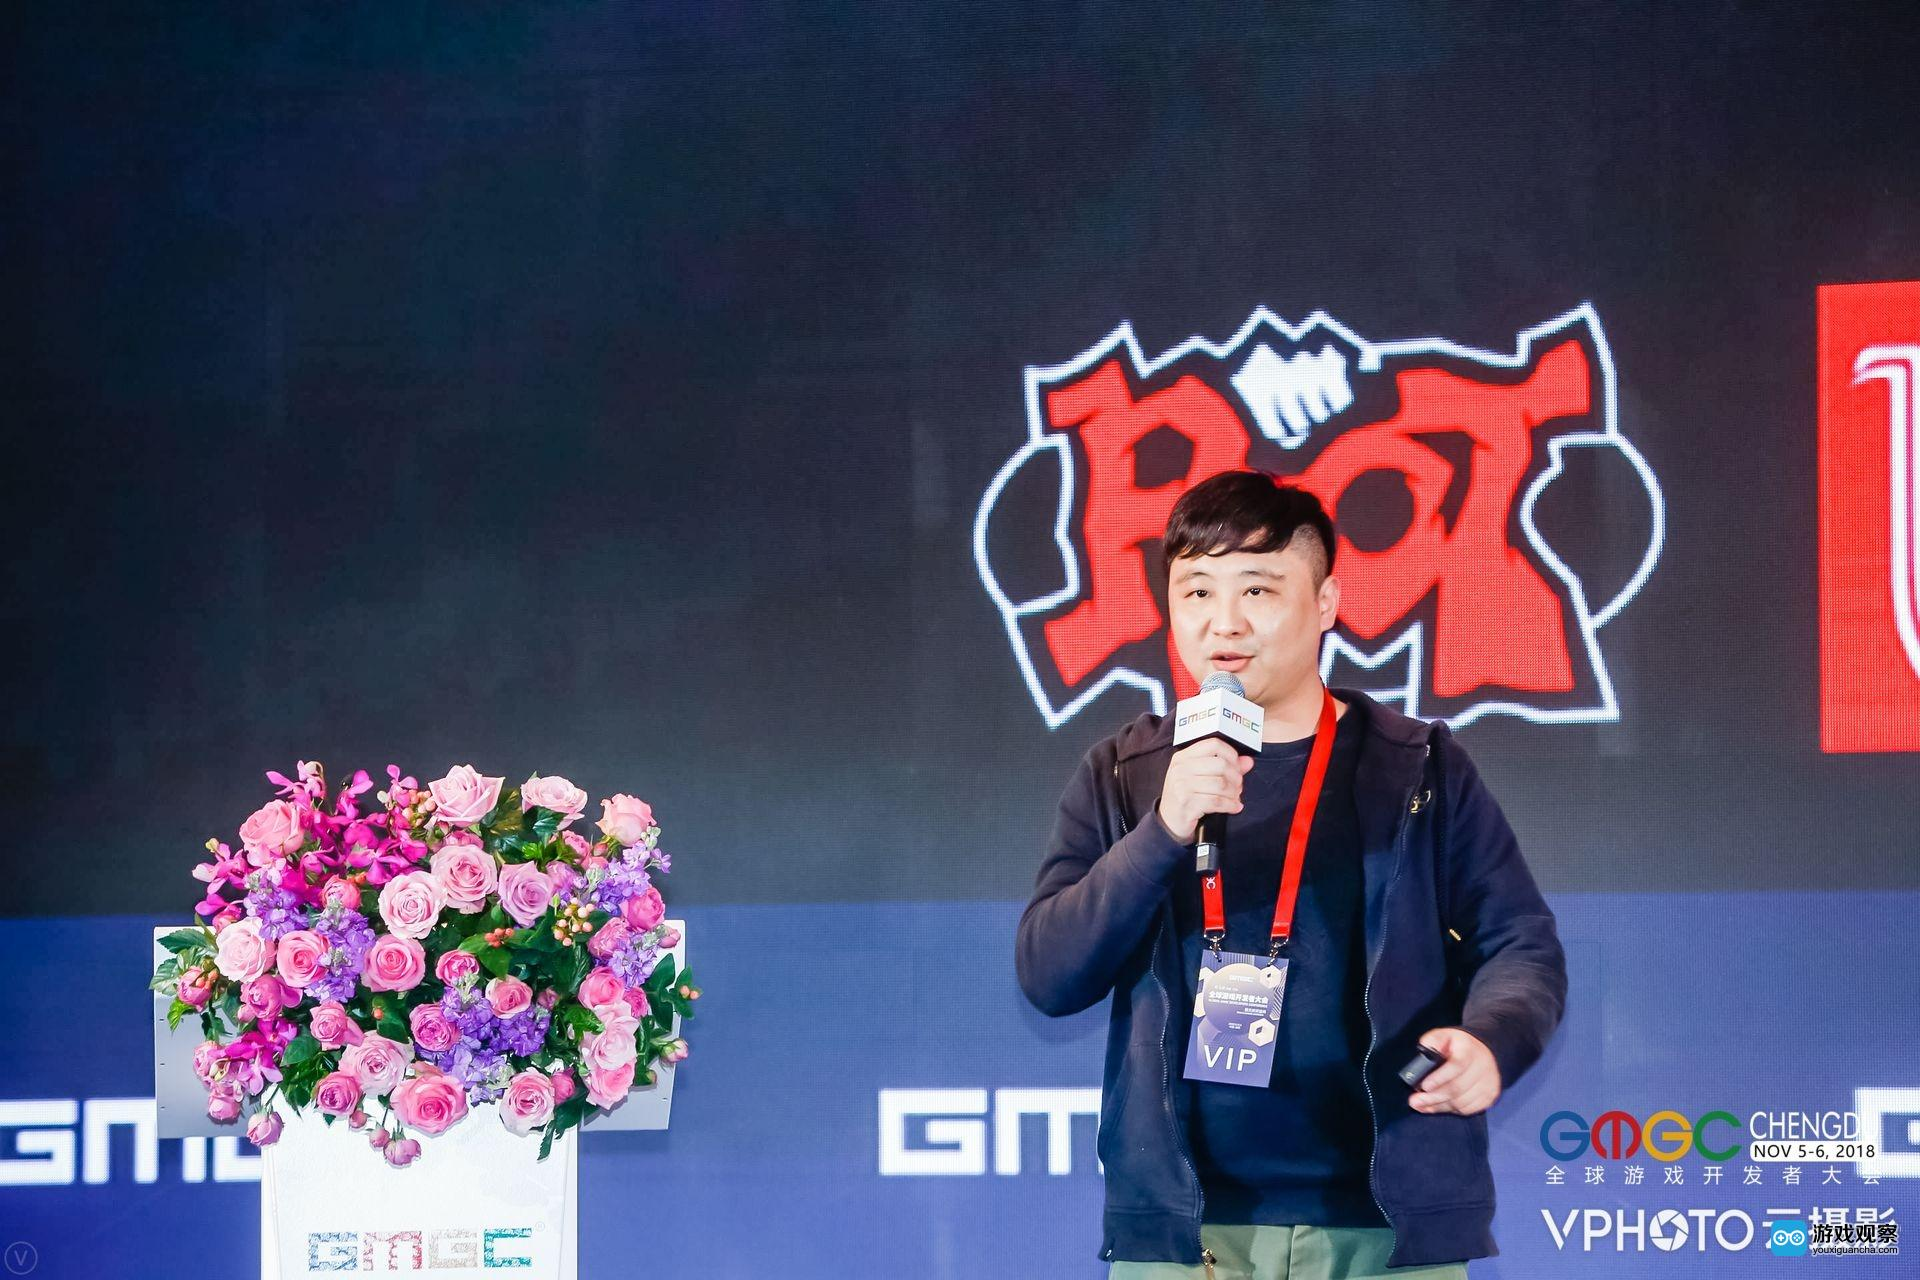 Riot Games China赵明义:电竞有潜力可以成为一个可持续的主流职业体育项目